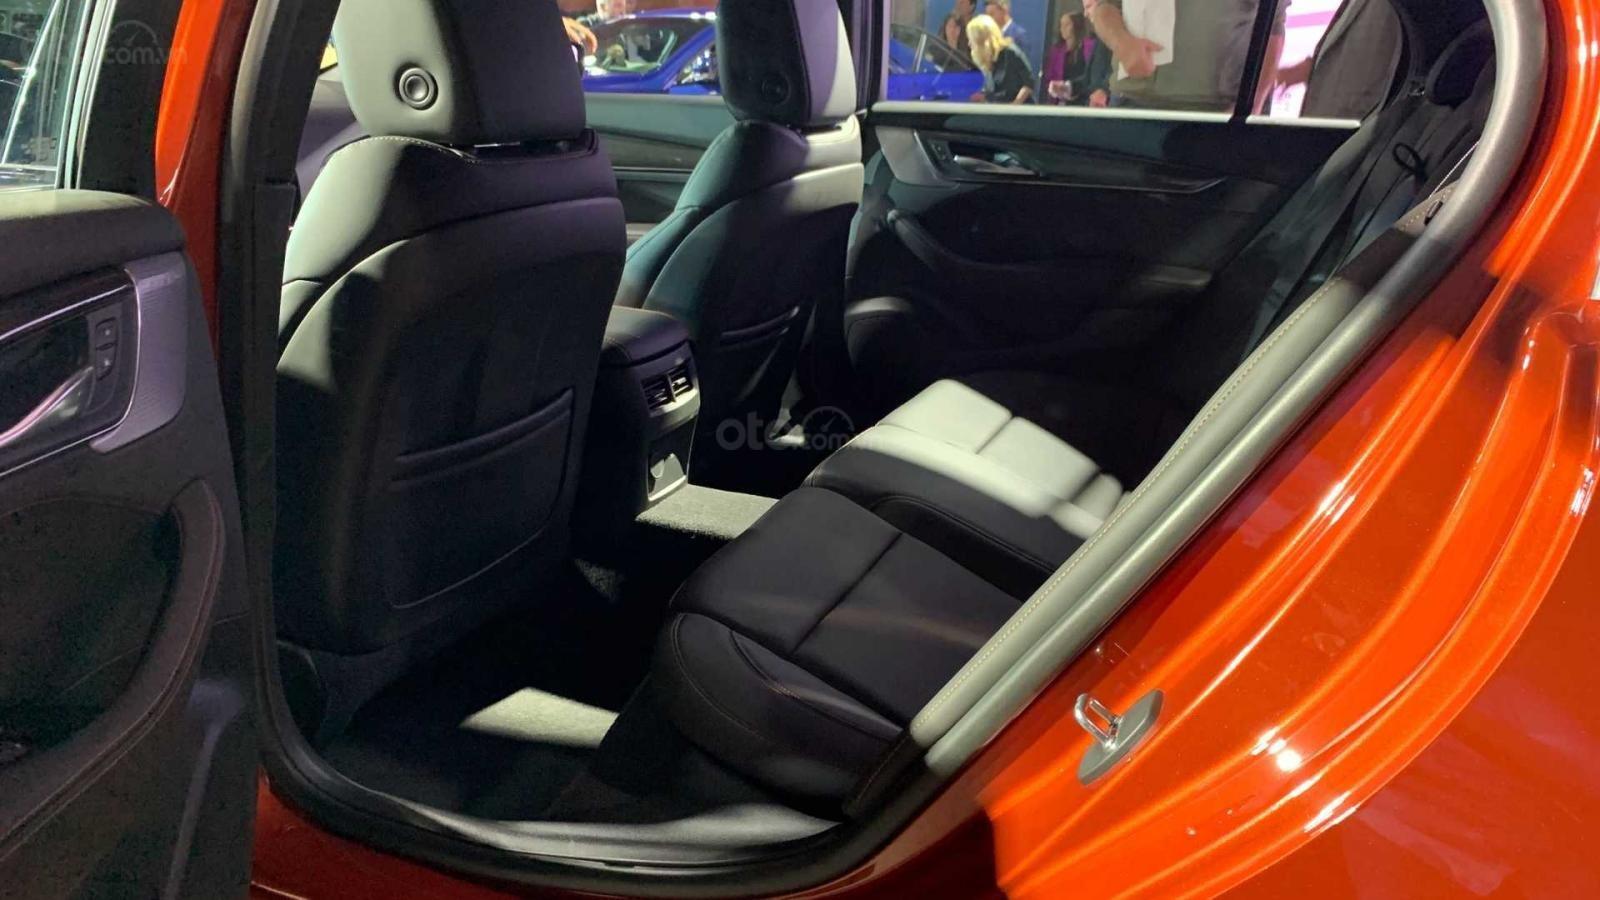 Cadillac CT5-V 2020 nội thất - 2